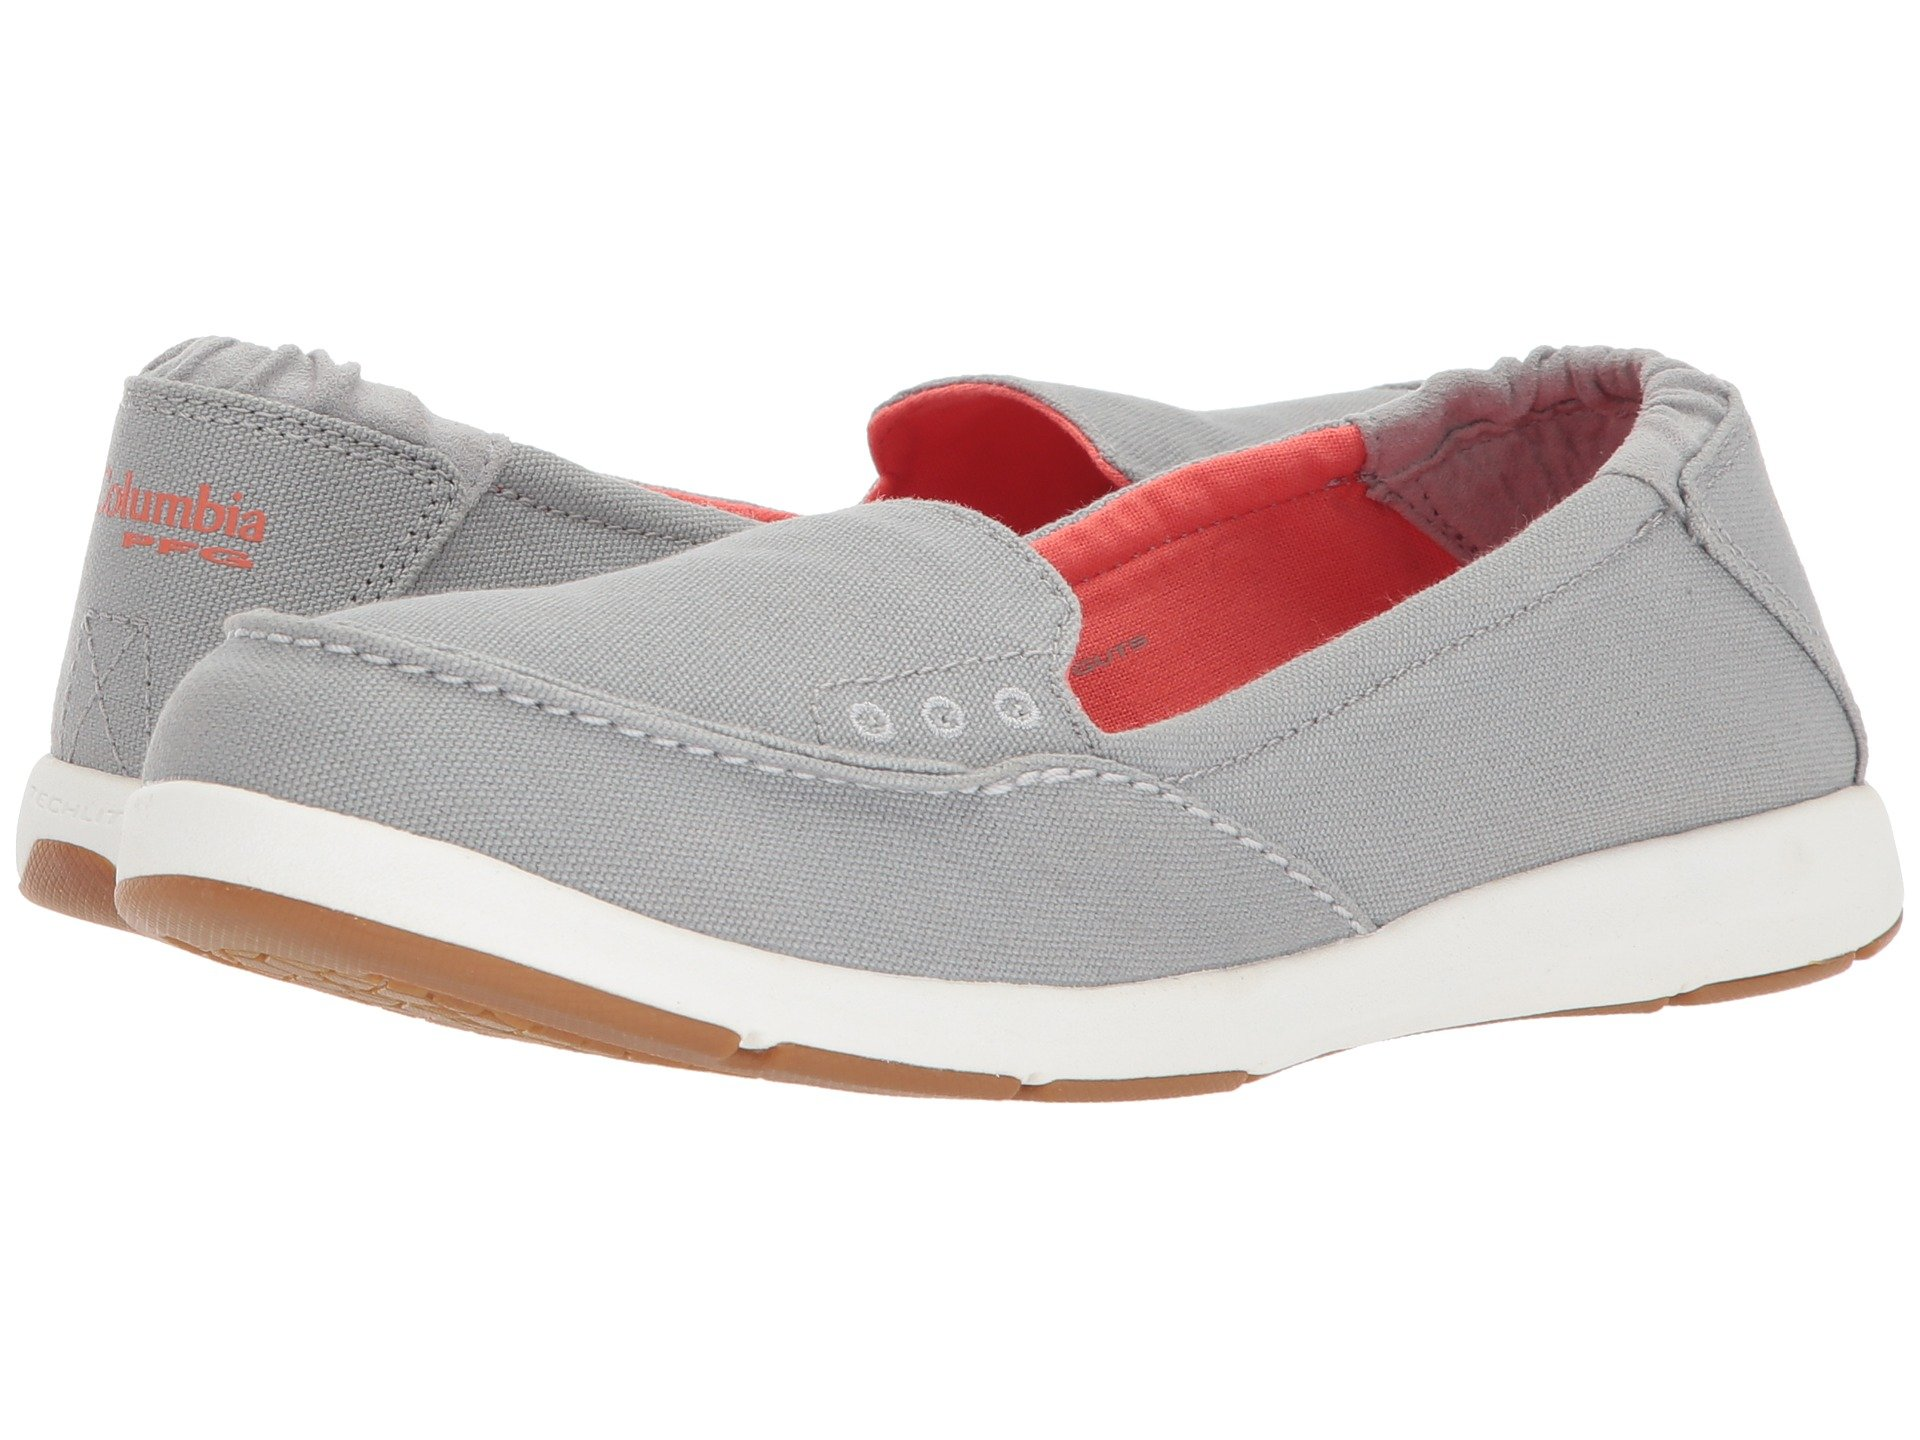 Boat Shoes para Mujer Columbia Delray Slip PFG  + Columbia en VeoyCompro.net